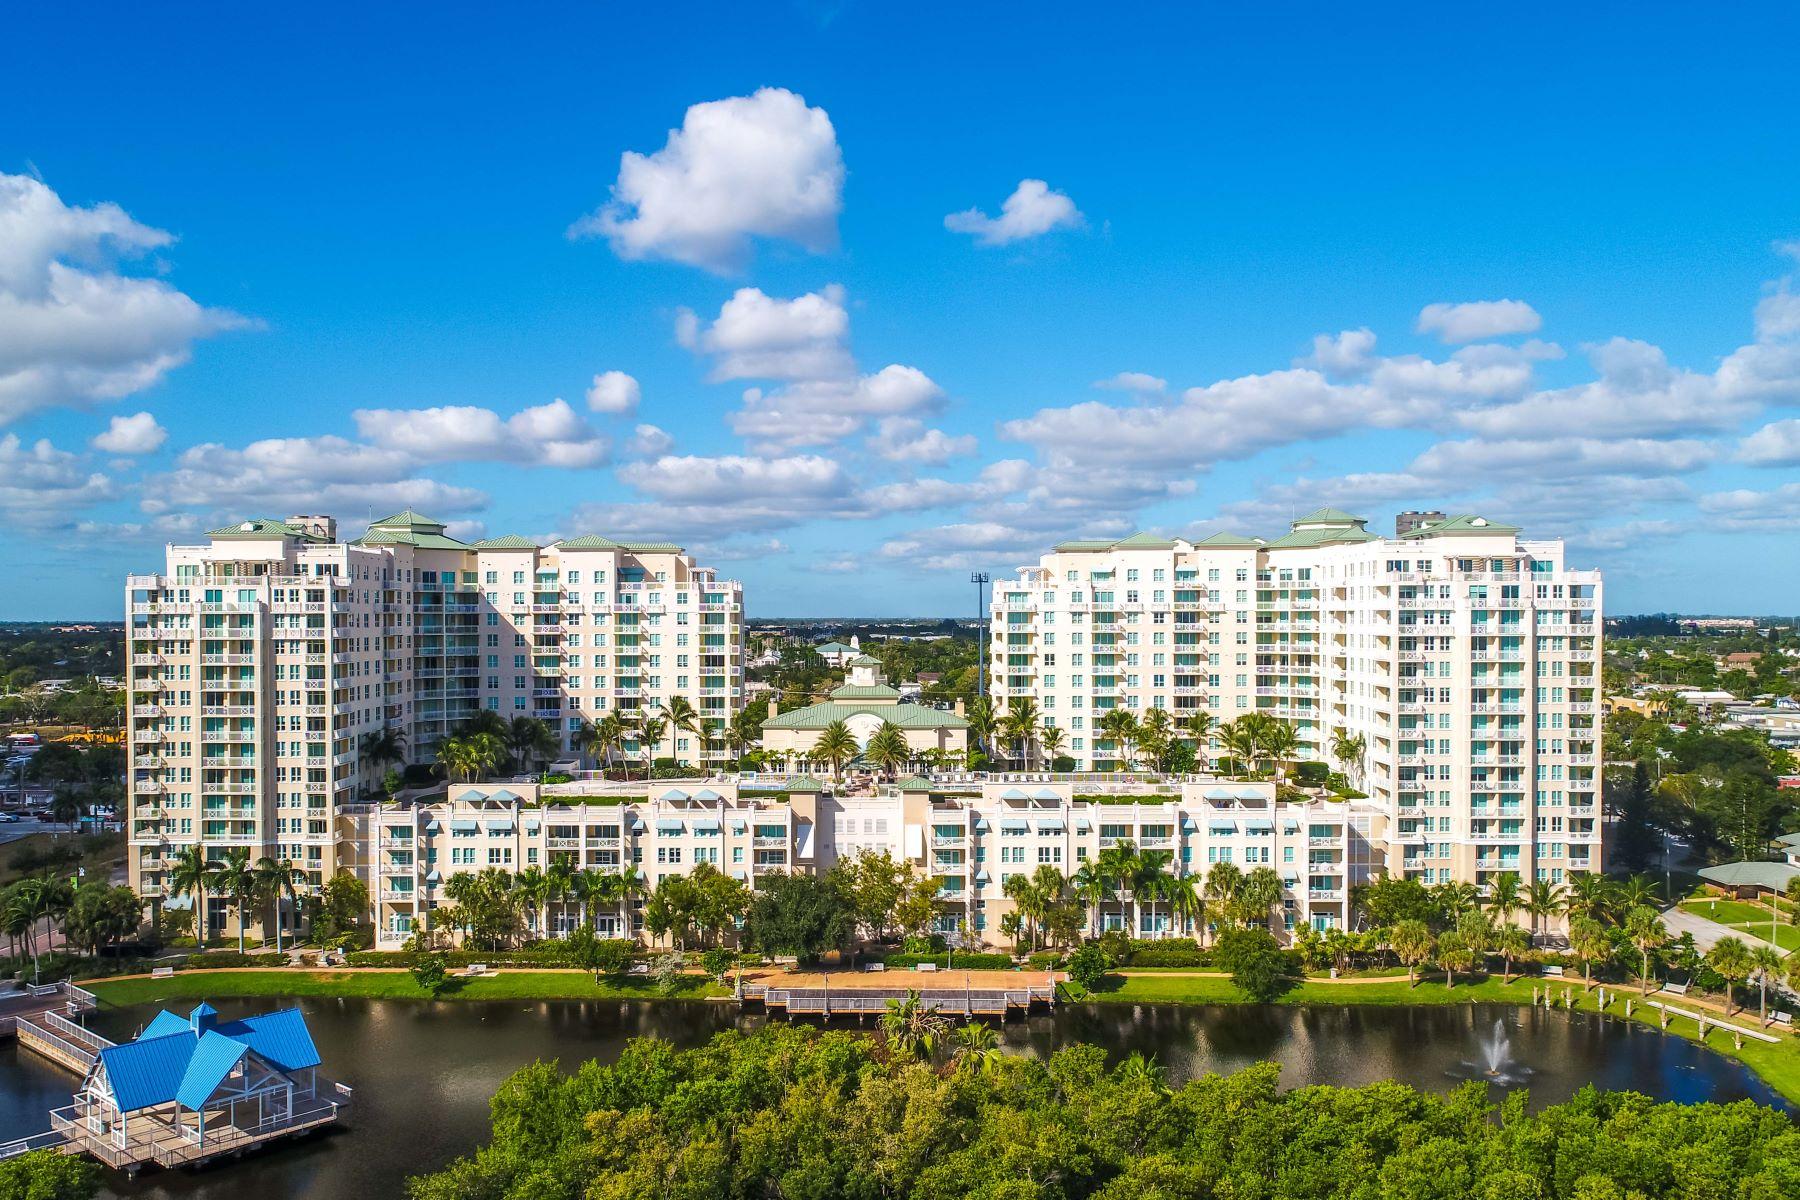 Кондоминиум для того Продажа на 450 N Federal Hwy 450 N Federal Hwy 814 Boynton Beach, Флорида 33435 Соединенные Штаты